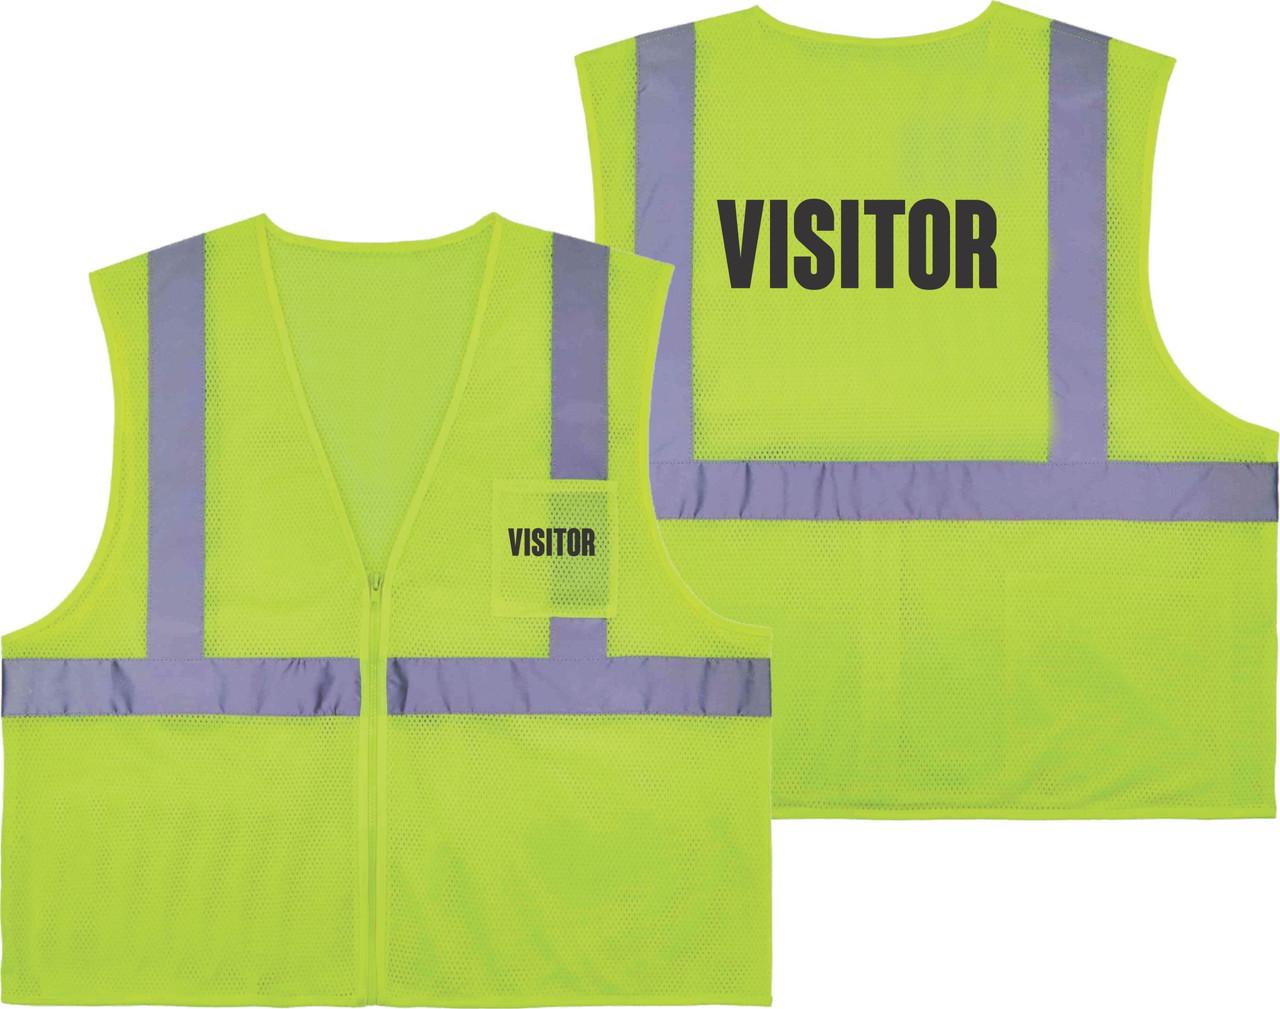 Printed VISITOR Safety Vest Class 2 - Great for Hi Vis Vest for Events